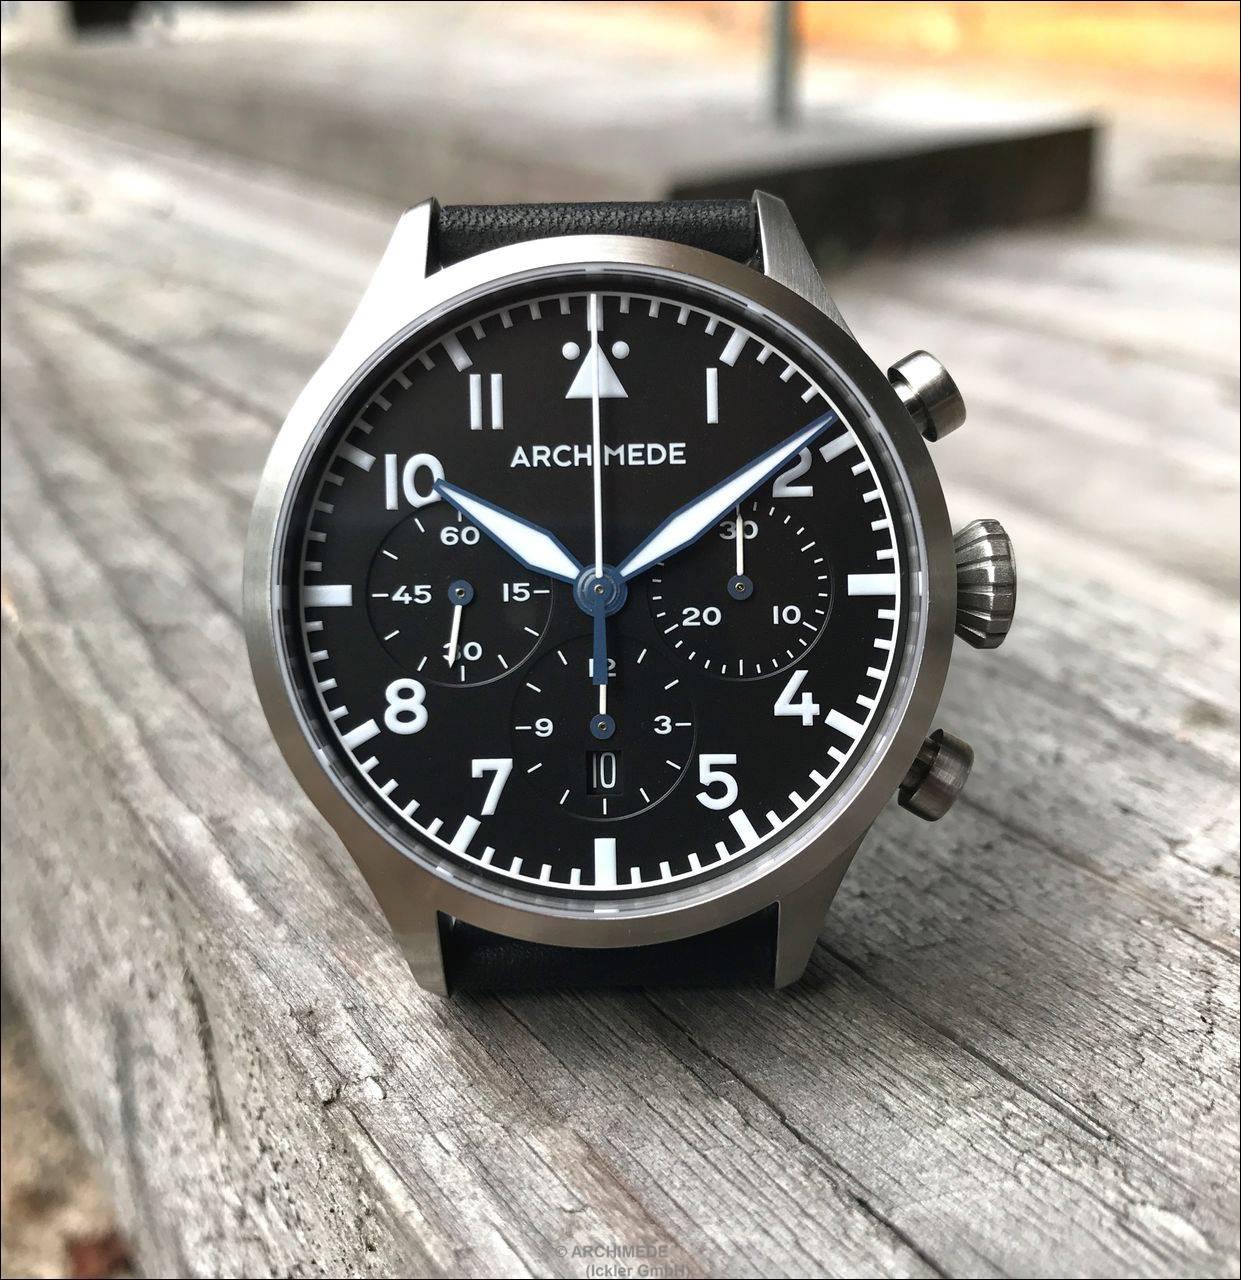 ARCHIMEDE Pilot TriKompax Chronograph